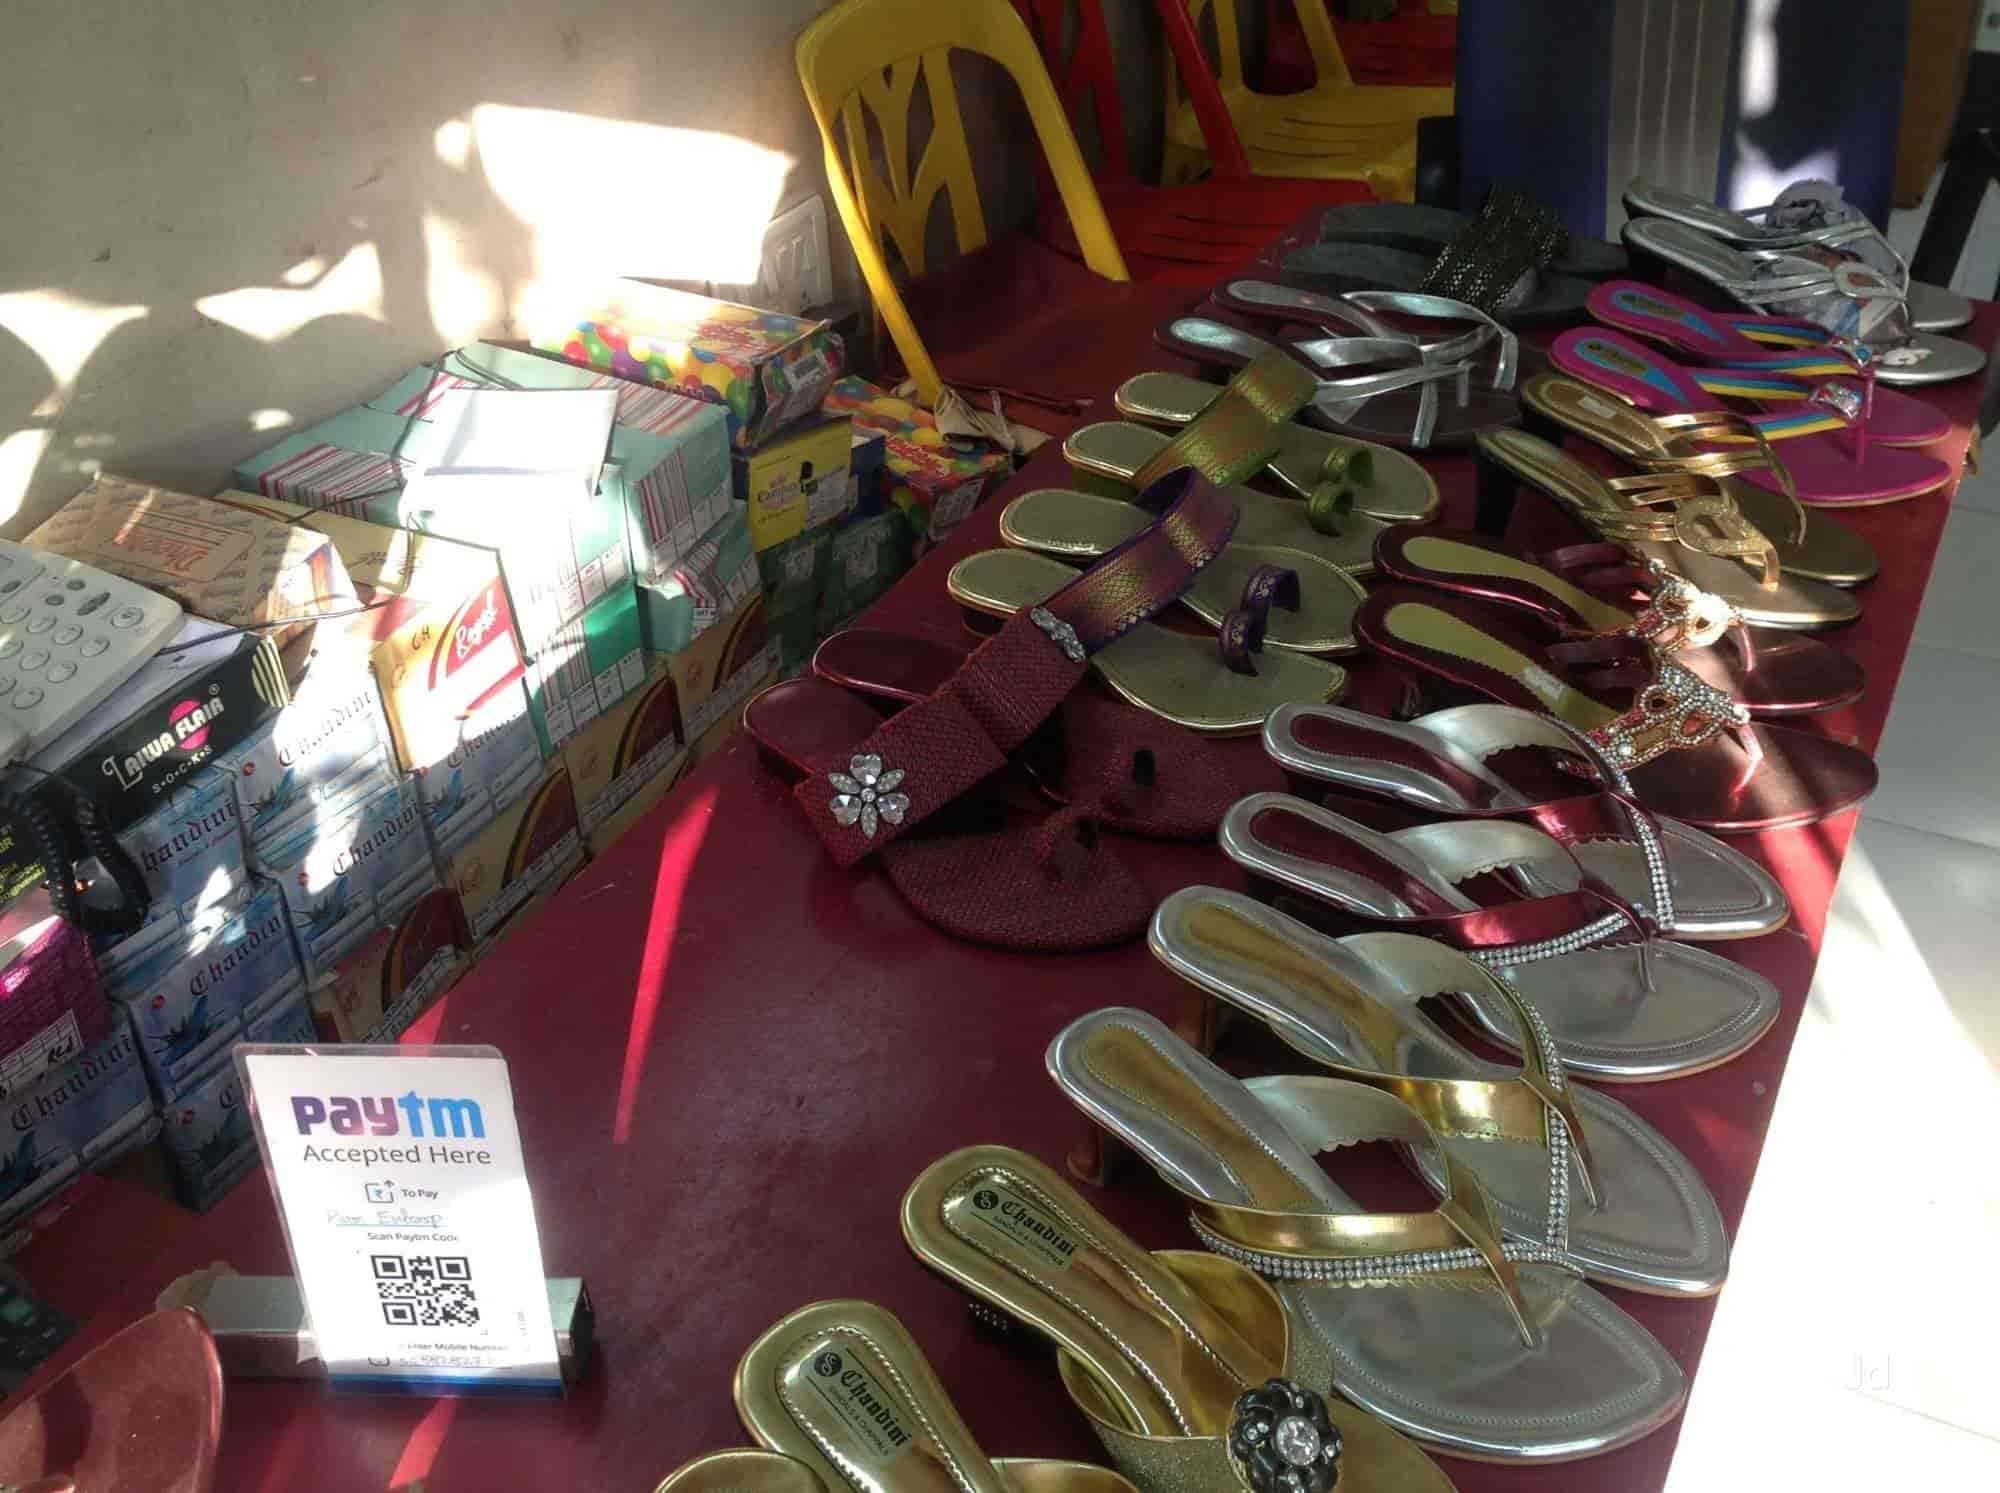 ShoesBaner In Acumen Dealers Shoe Pune Justdial bfyvm6I7gY